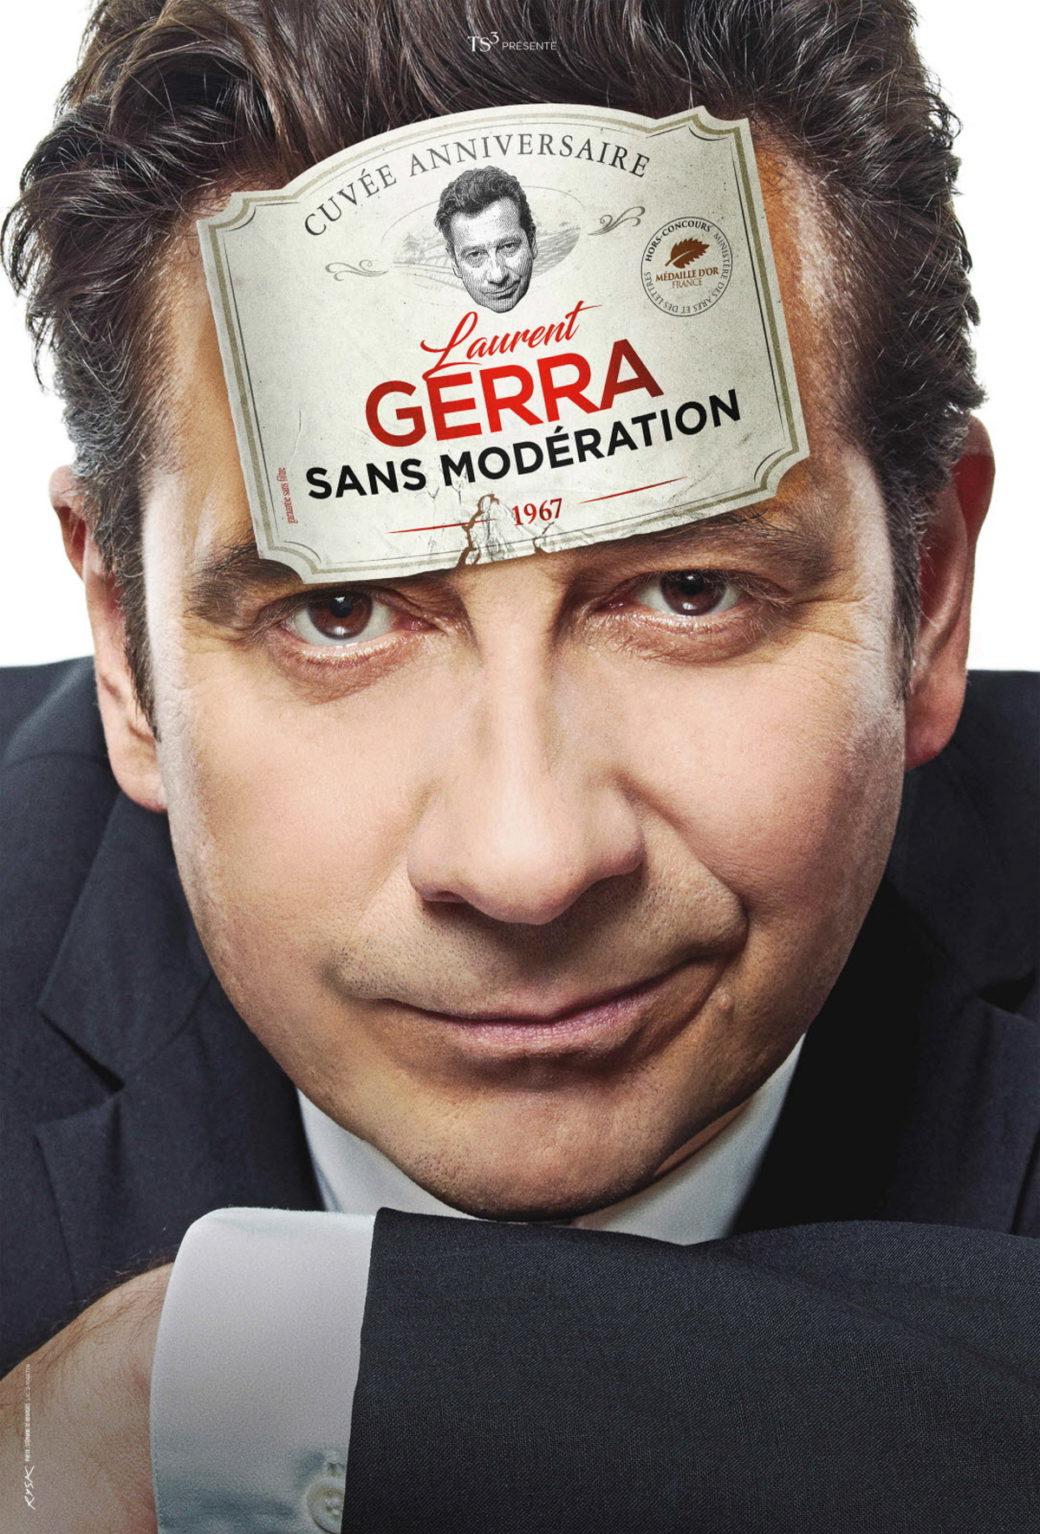 illustration-laurent-gerra-sans-moderation